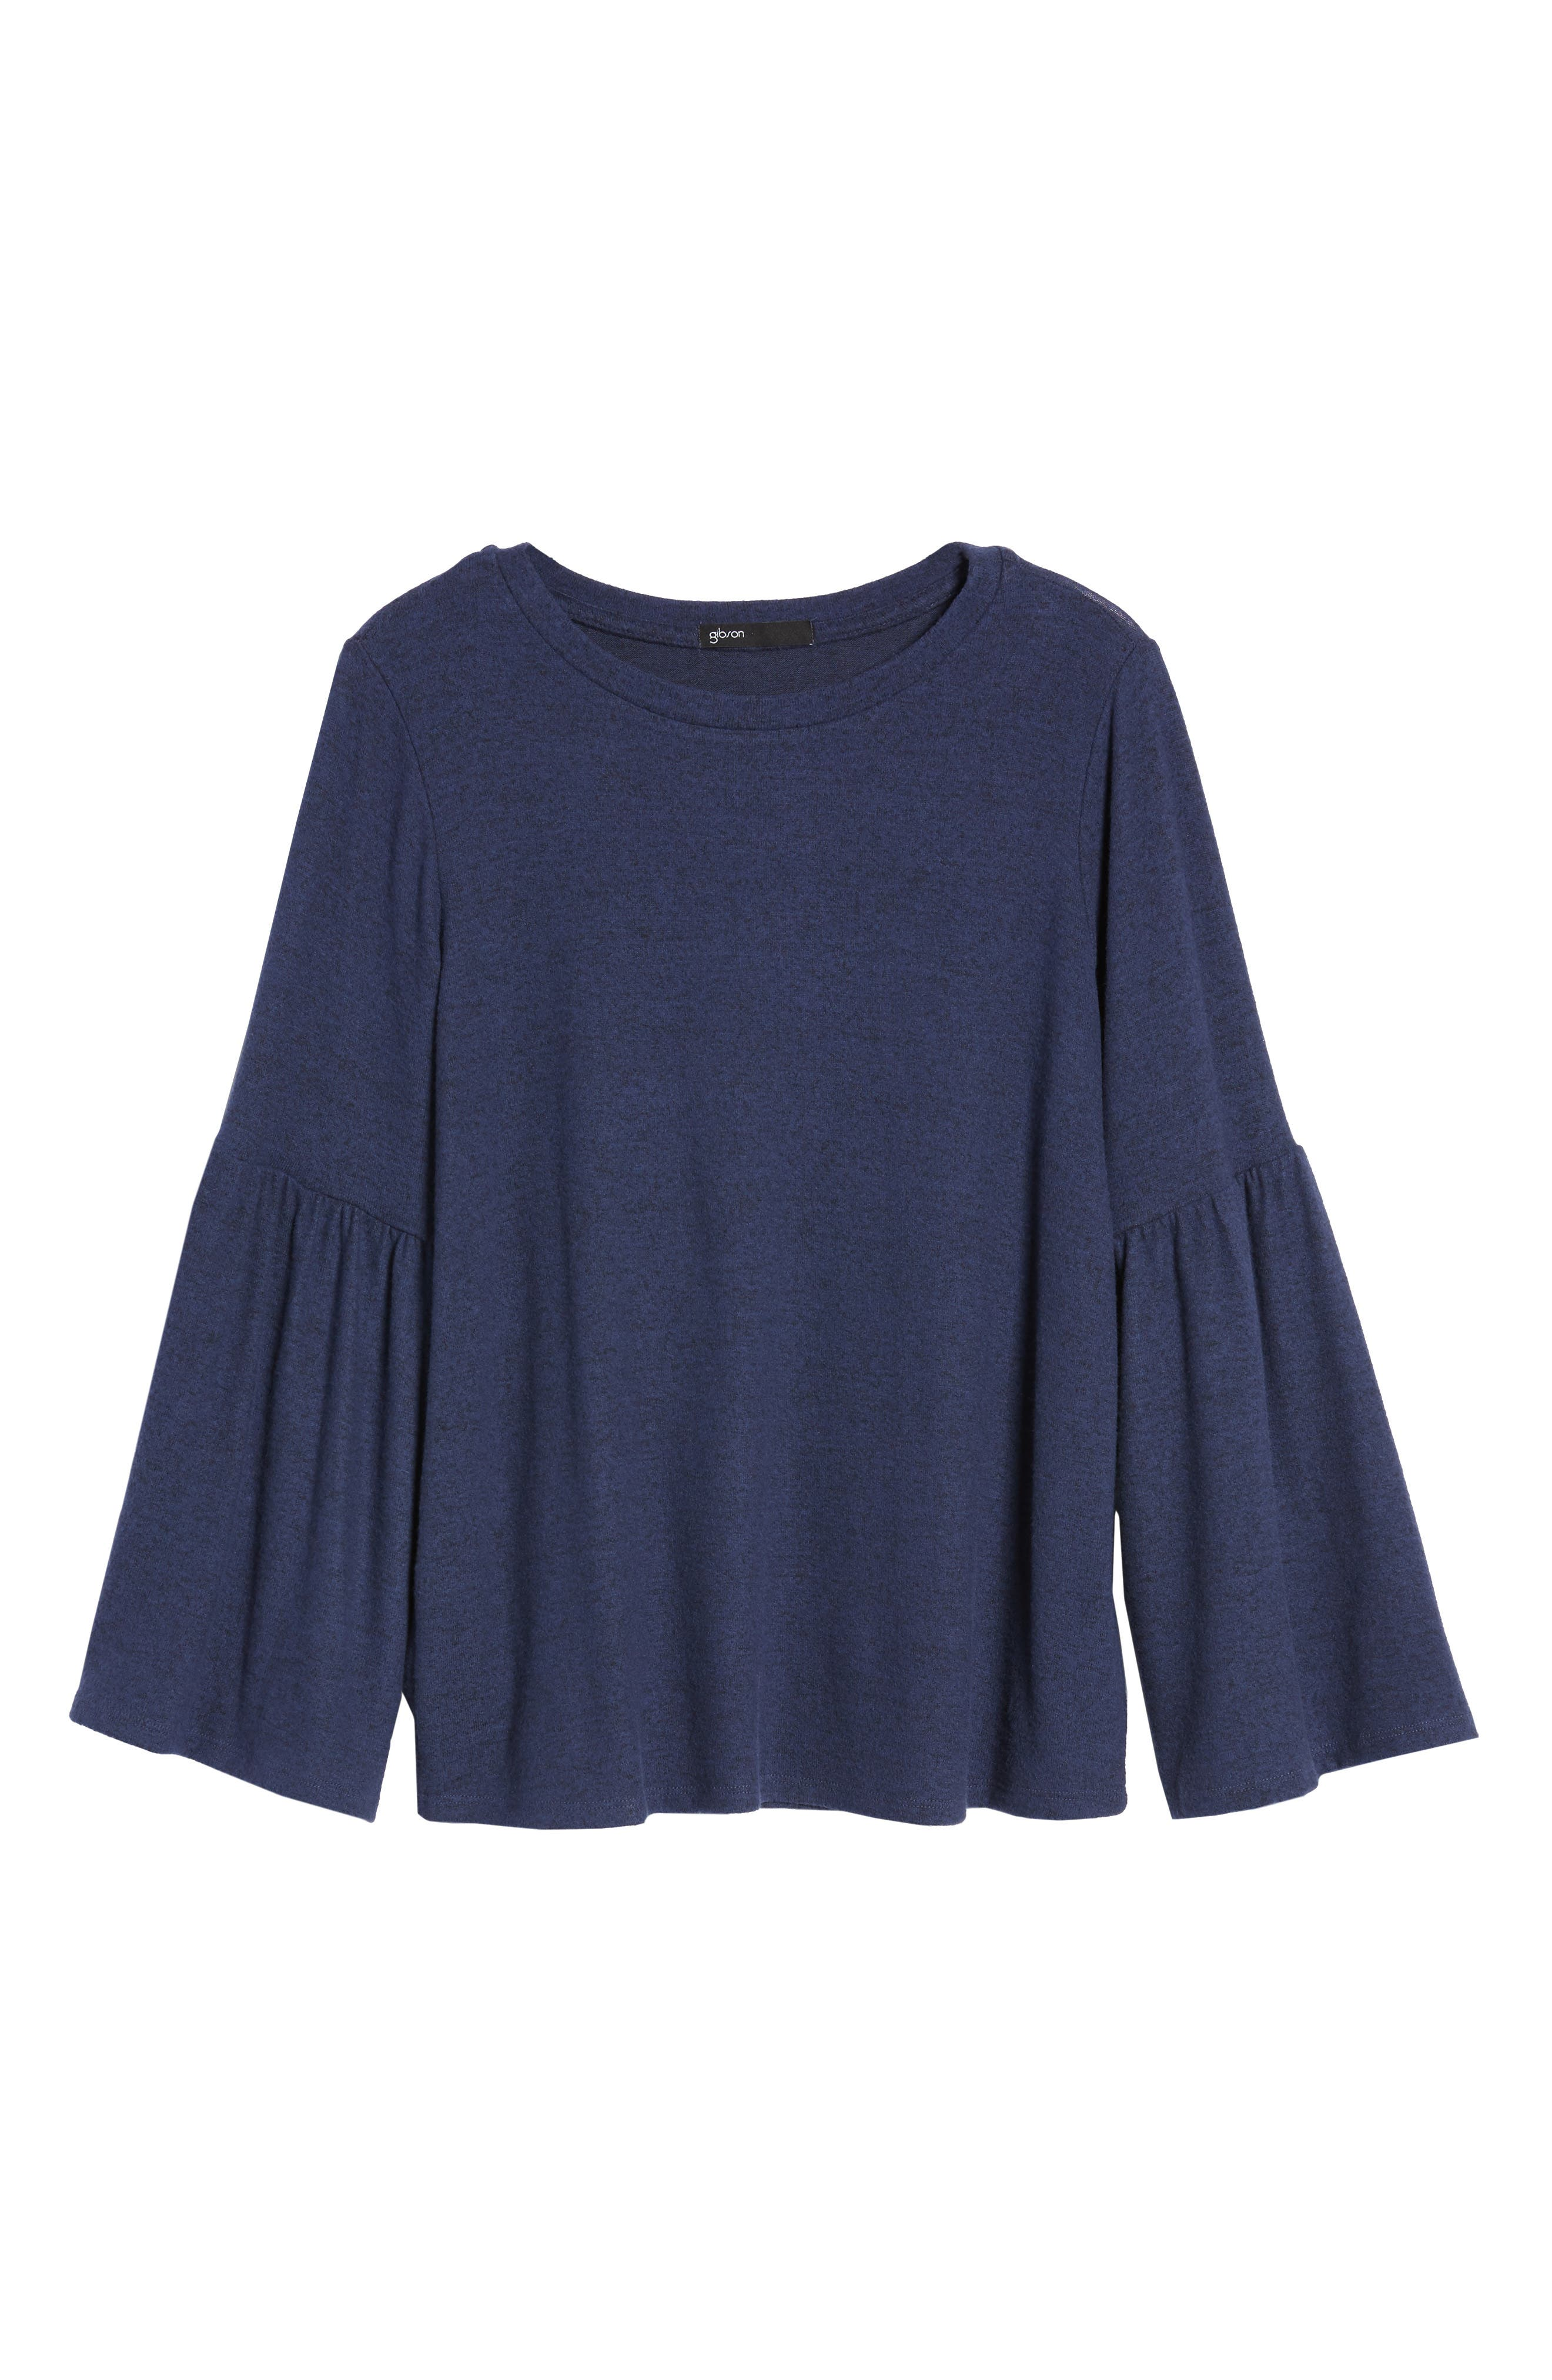 GIBSON,                             Bell Sleeve Cozy Fleece Pullover,                             Alternate thumbnail 6, color,                             415